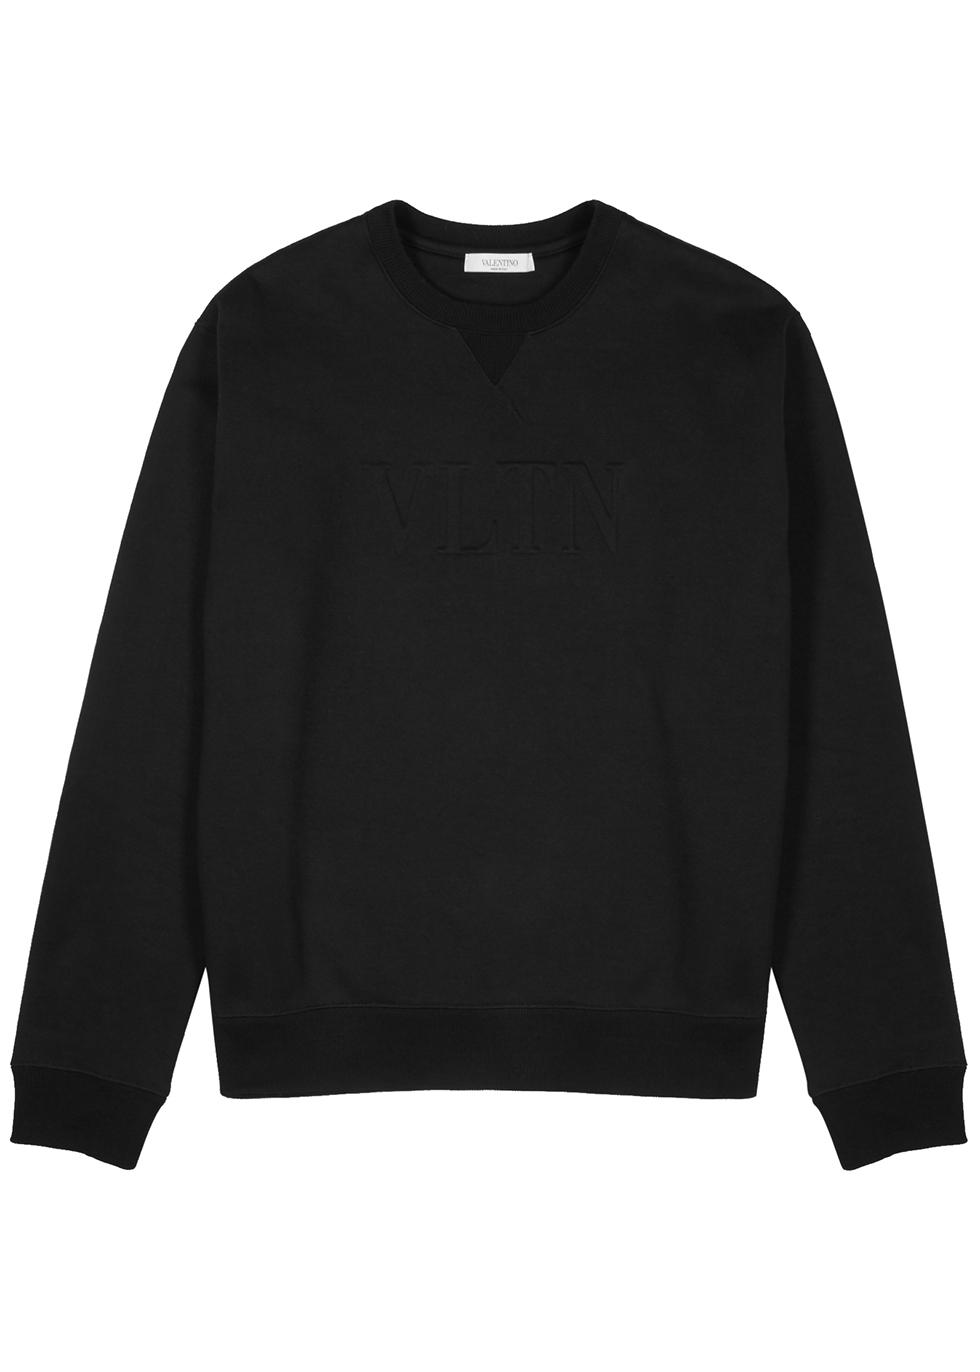 e213fa2226af0 Men s Designer Sweatshirts - Harvey Nichols